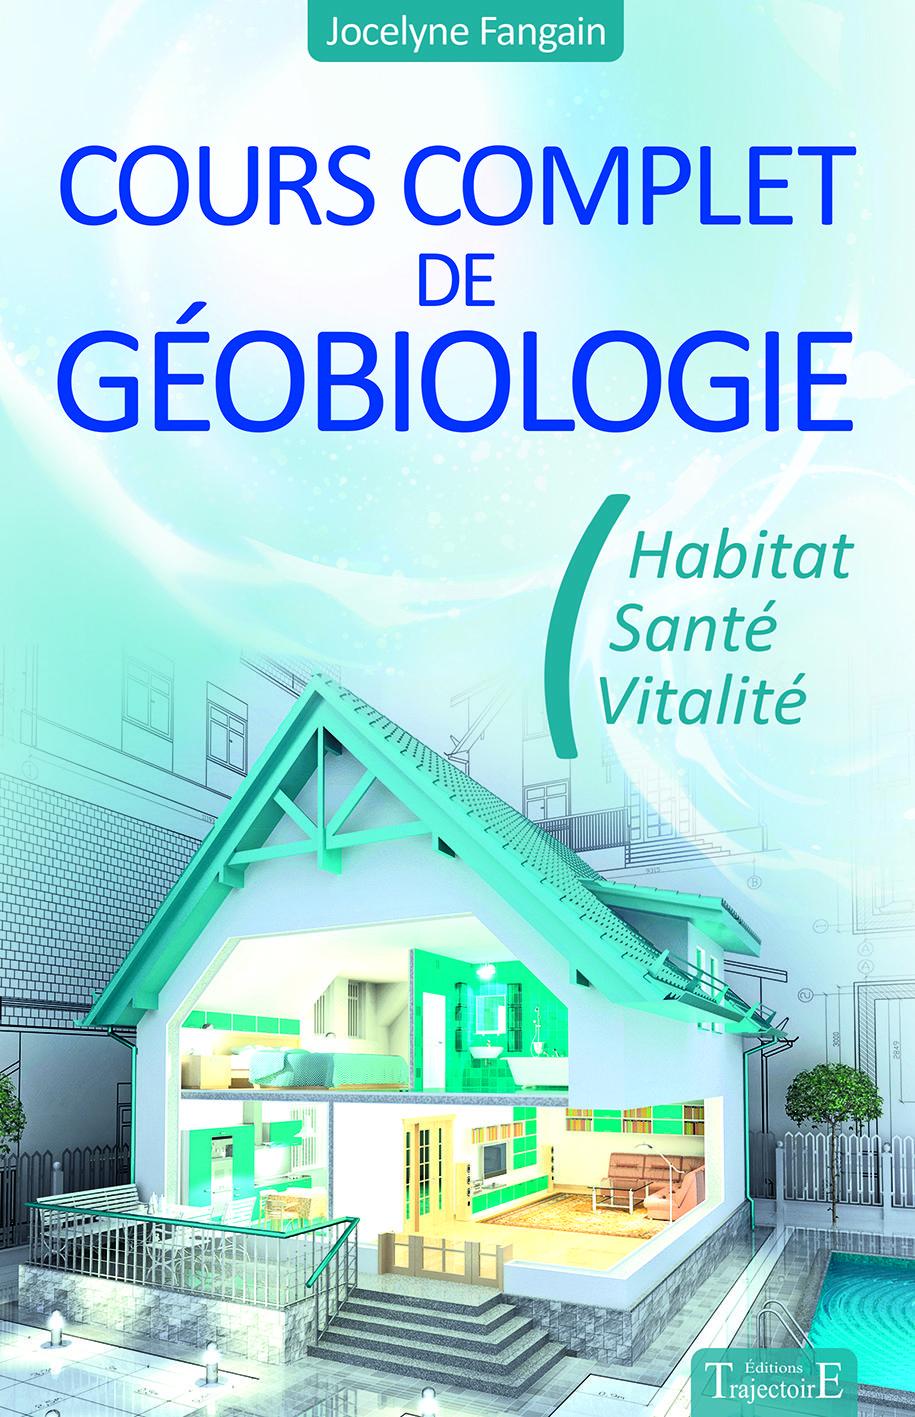 Cours Complet De Geobiologie De Jocelyne Fangain Editions Trajectoire 192 P Geobiologie Habitat Radiesthesie